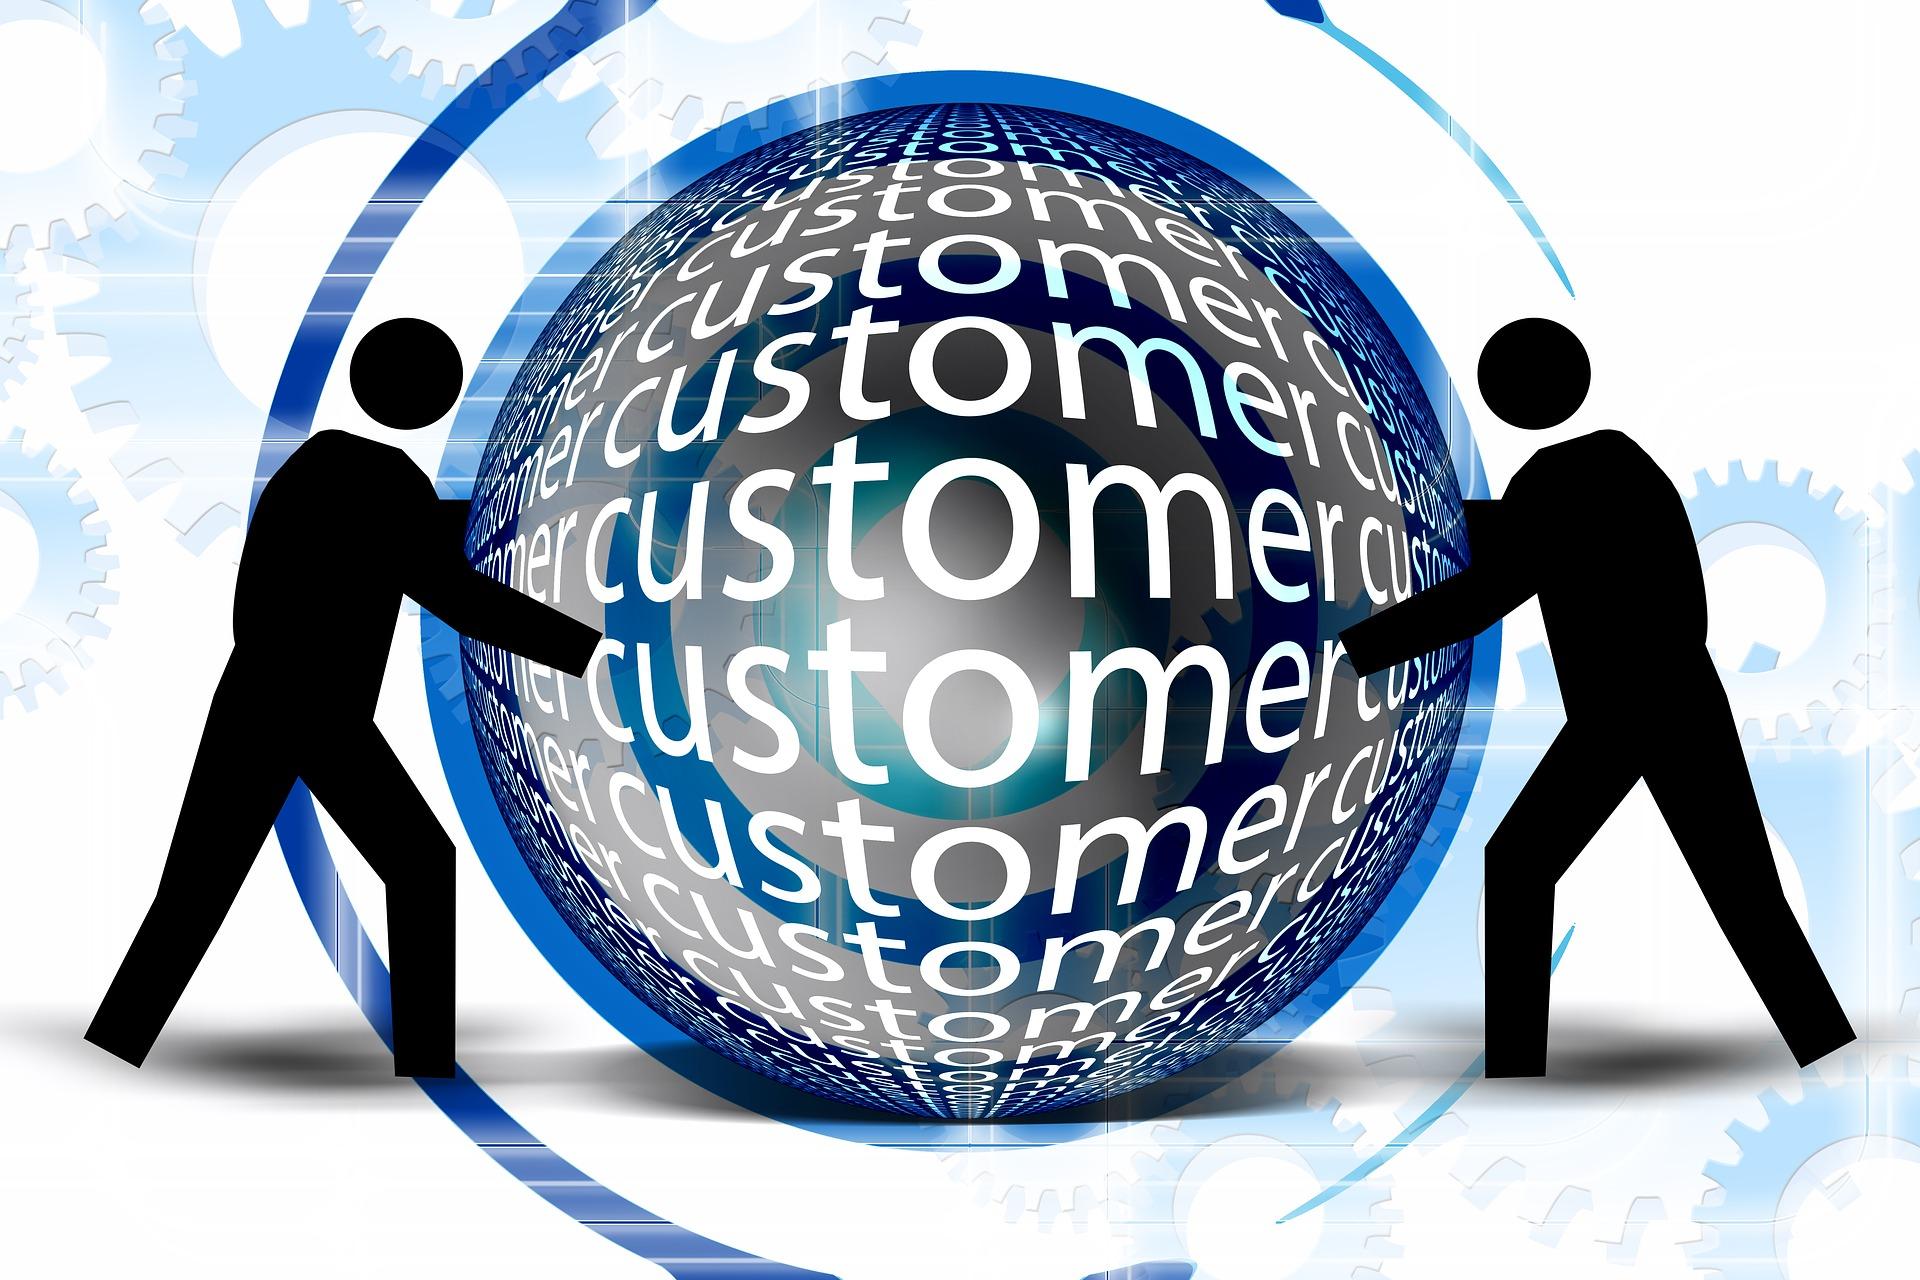 Customer text image: